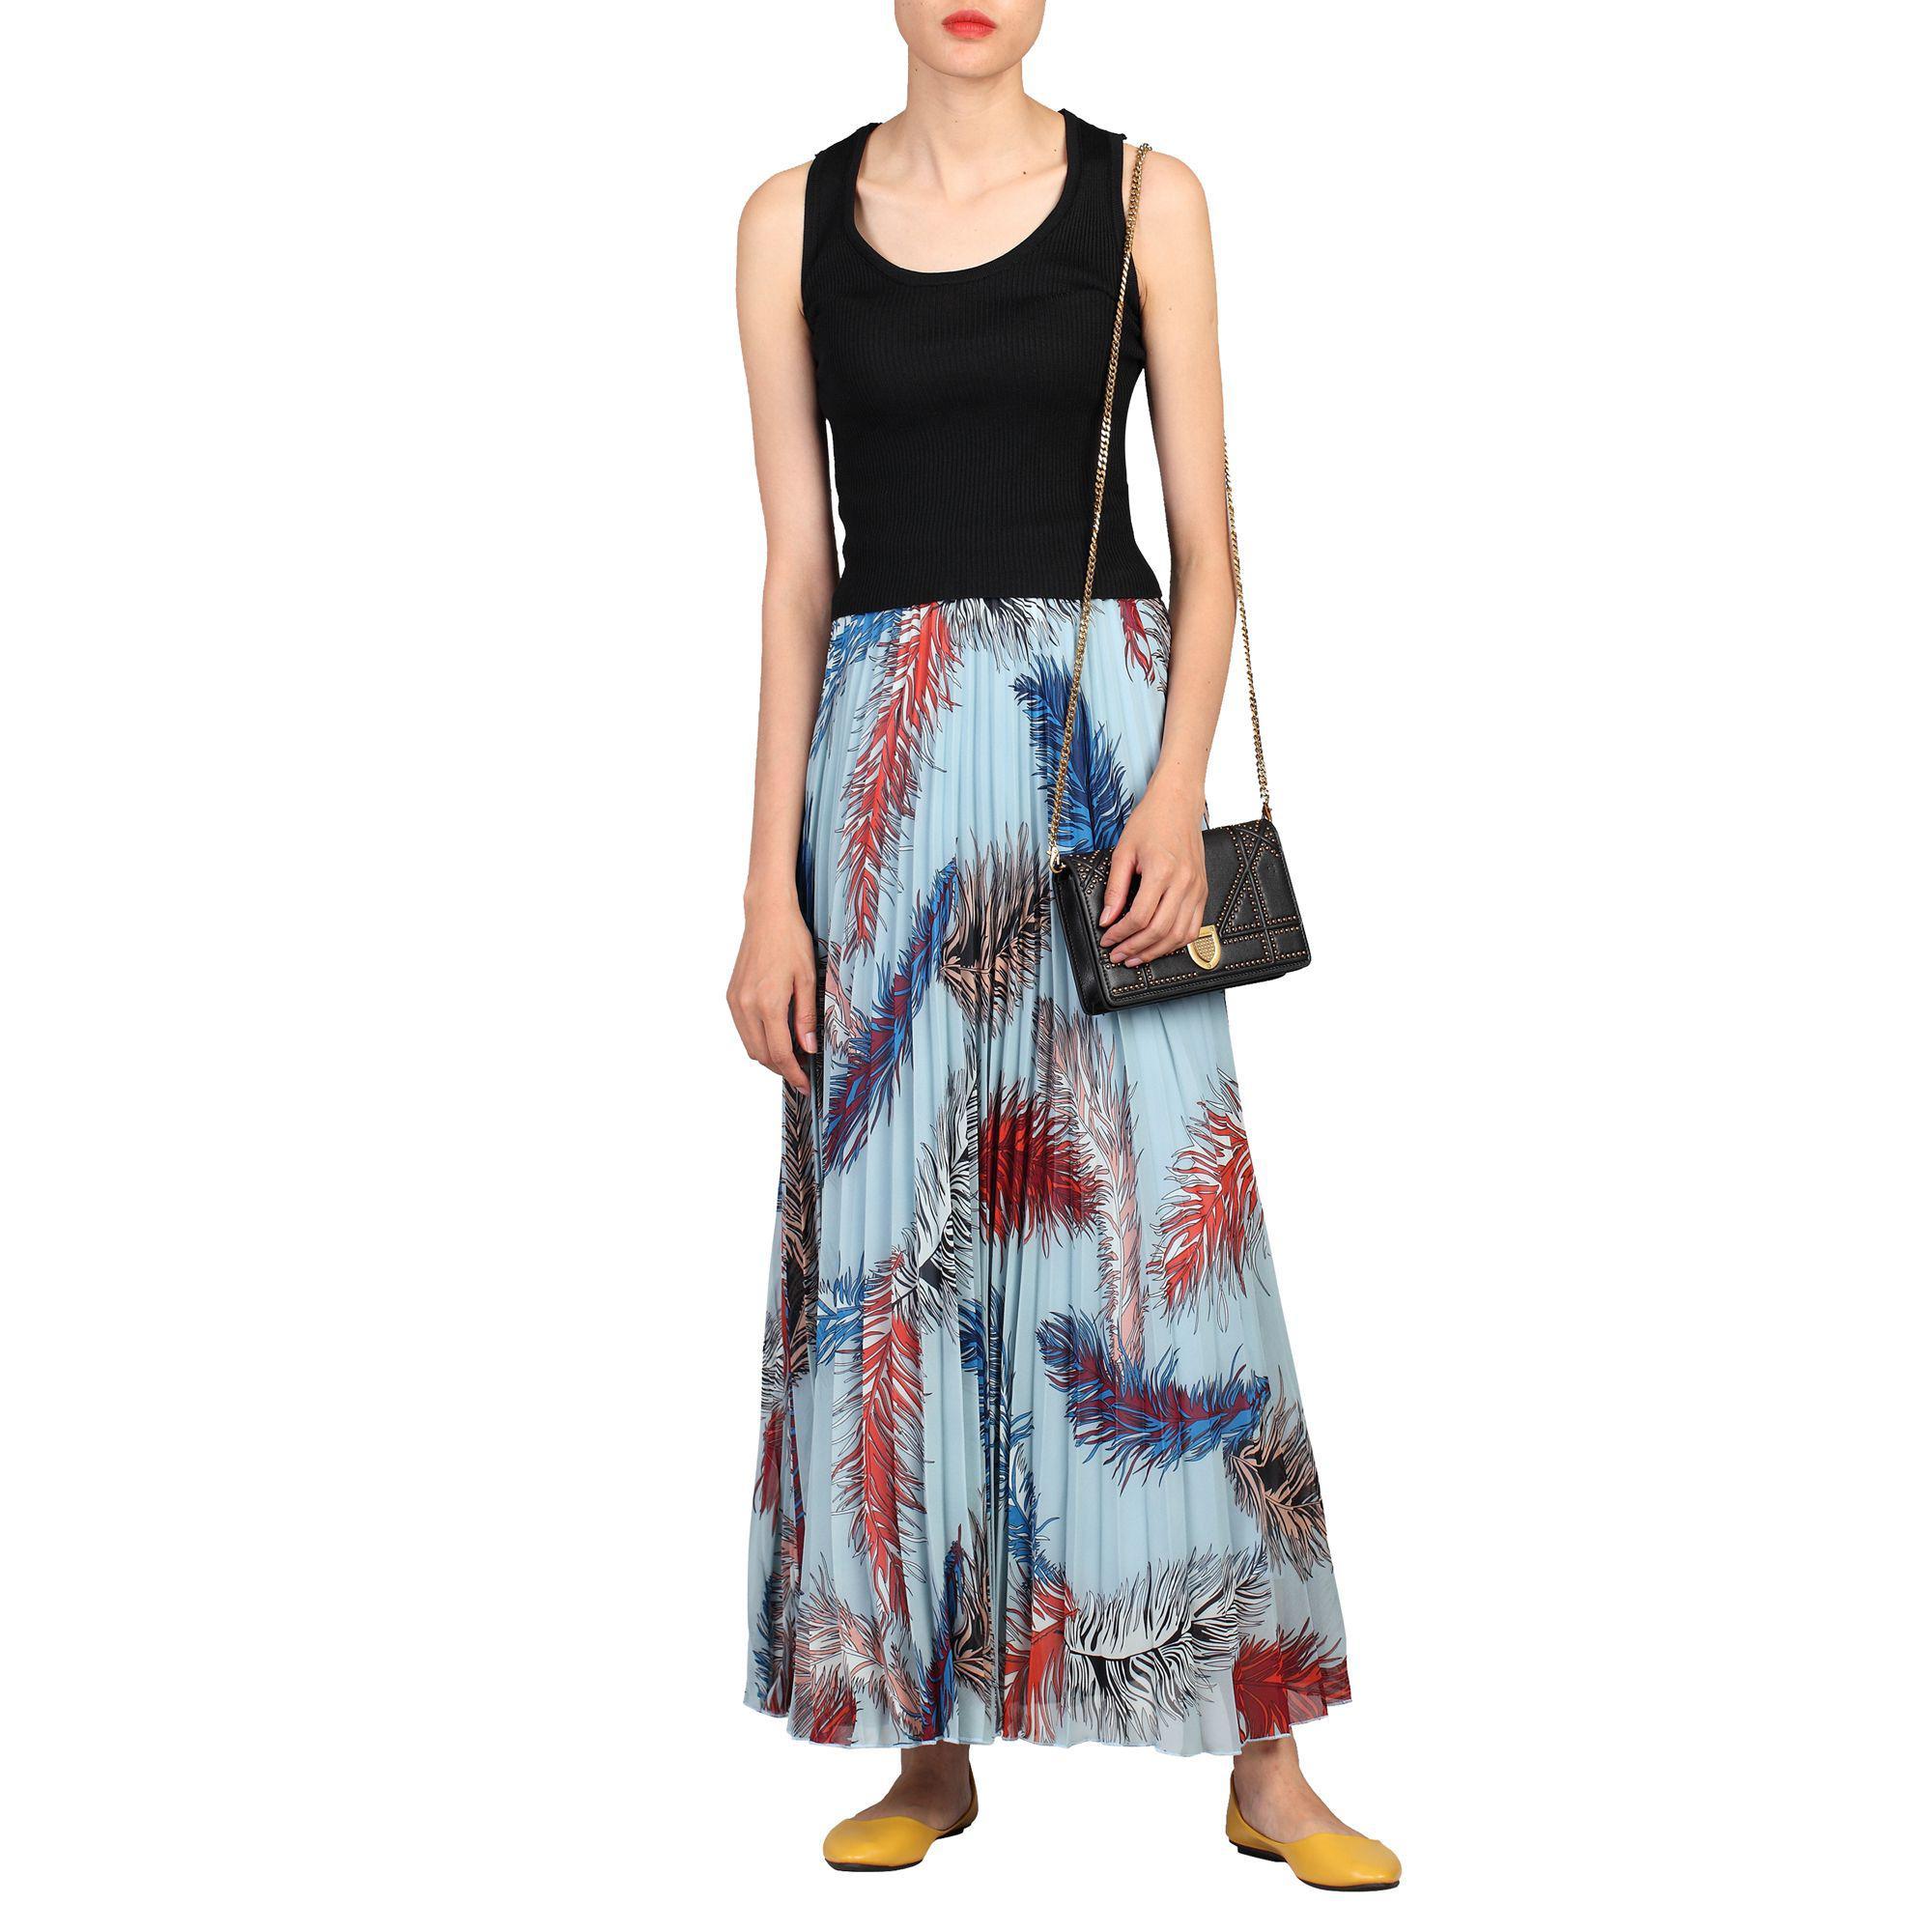 ade0d97b7c Jolie Moi Blue Print Pleated Maxi Skirt in Blue - Save 26% - Lyst